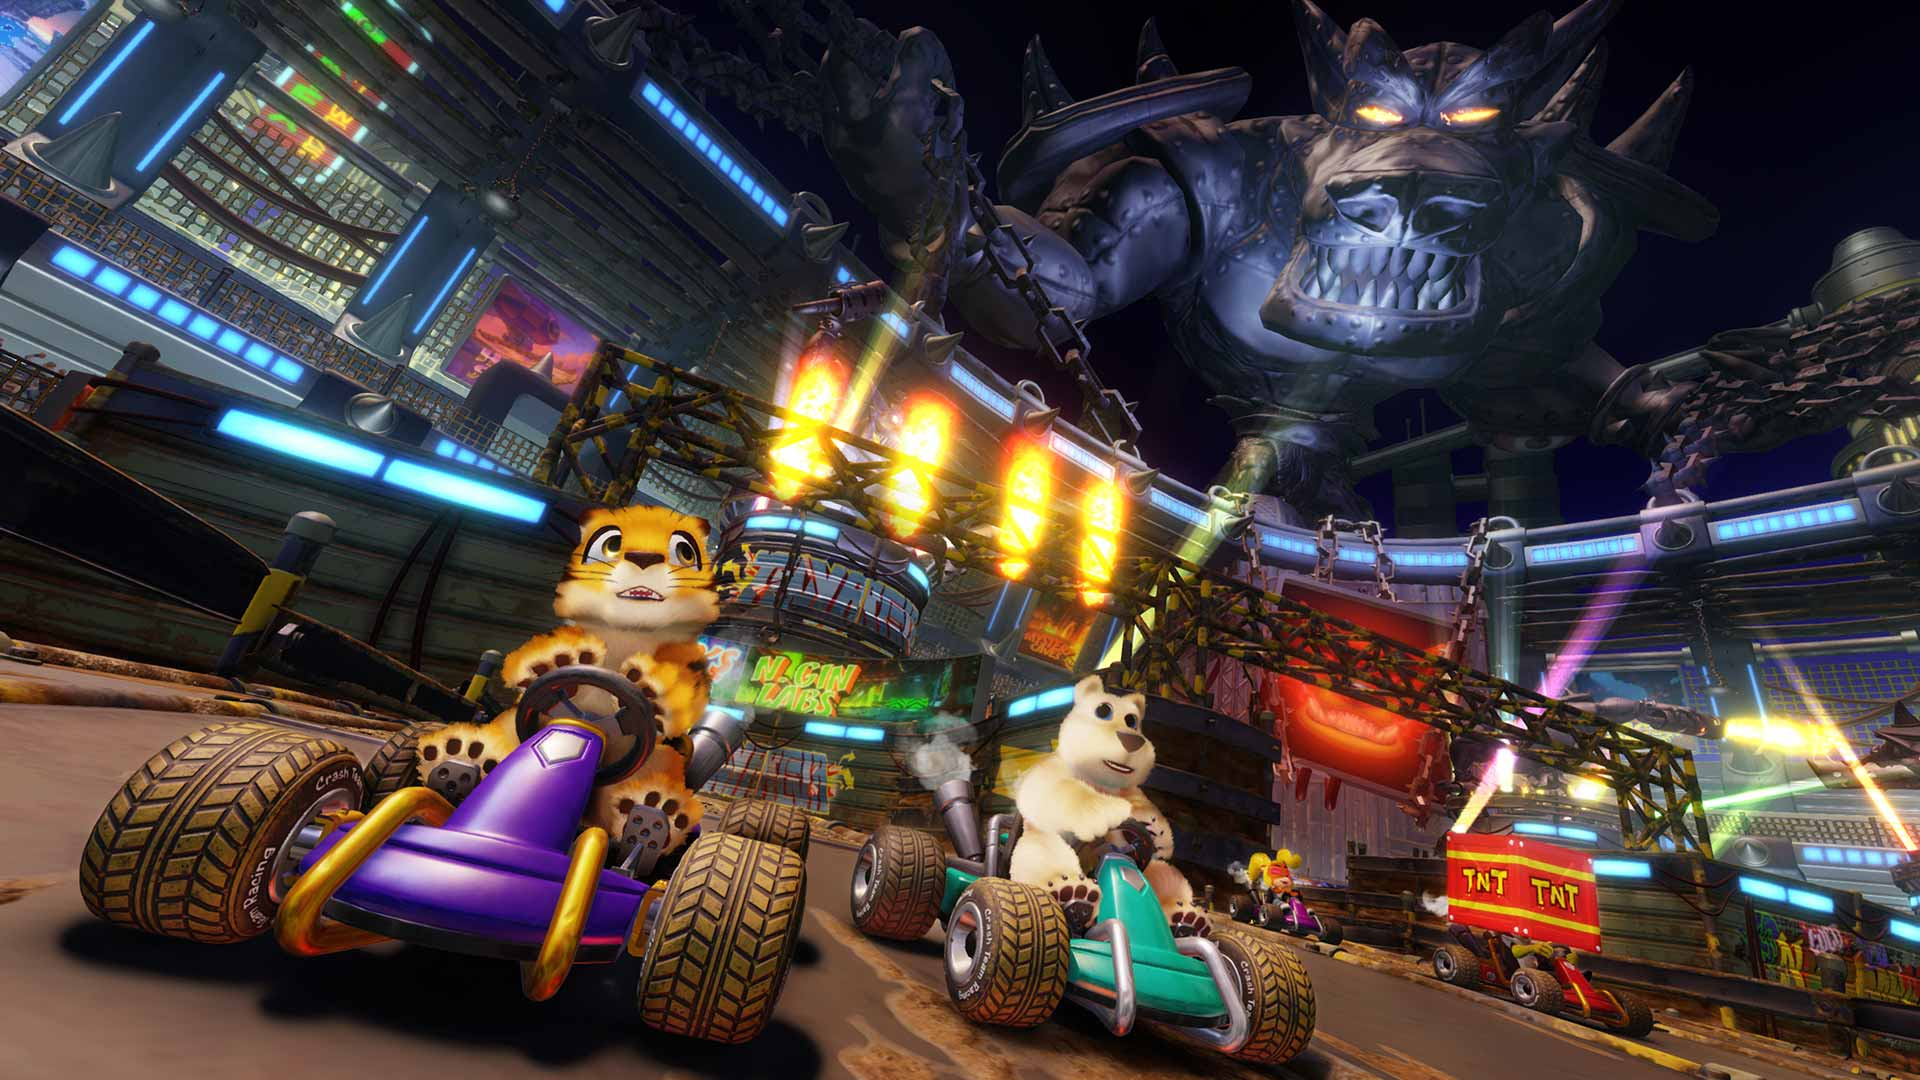 Crash Team Racing Nitro-Fueled arena